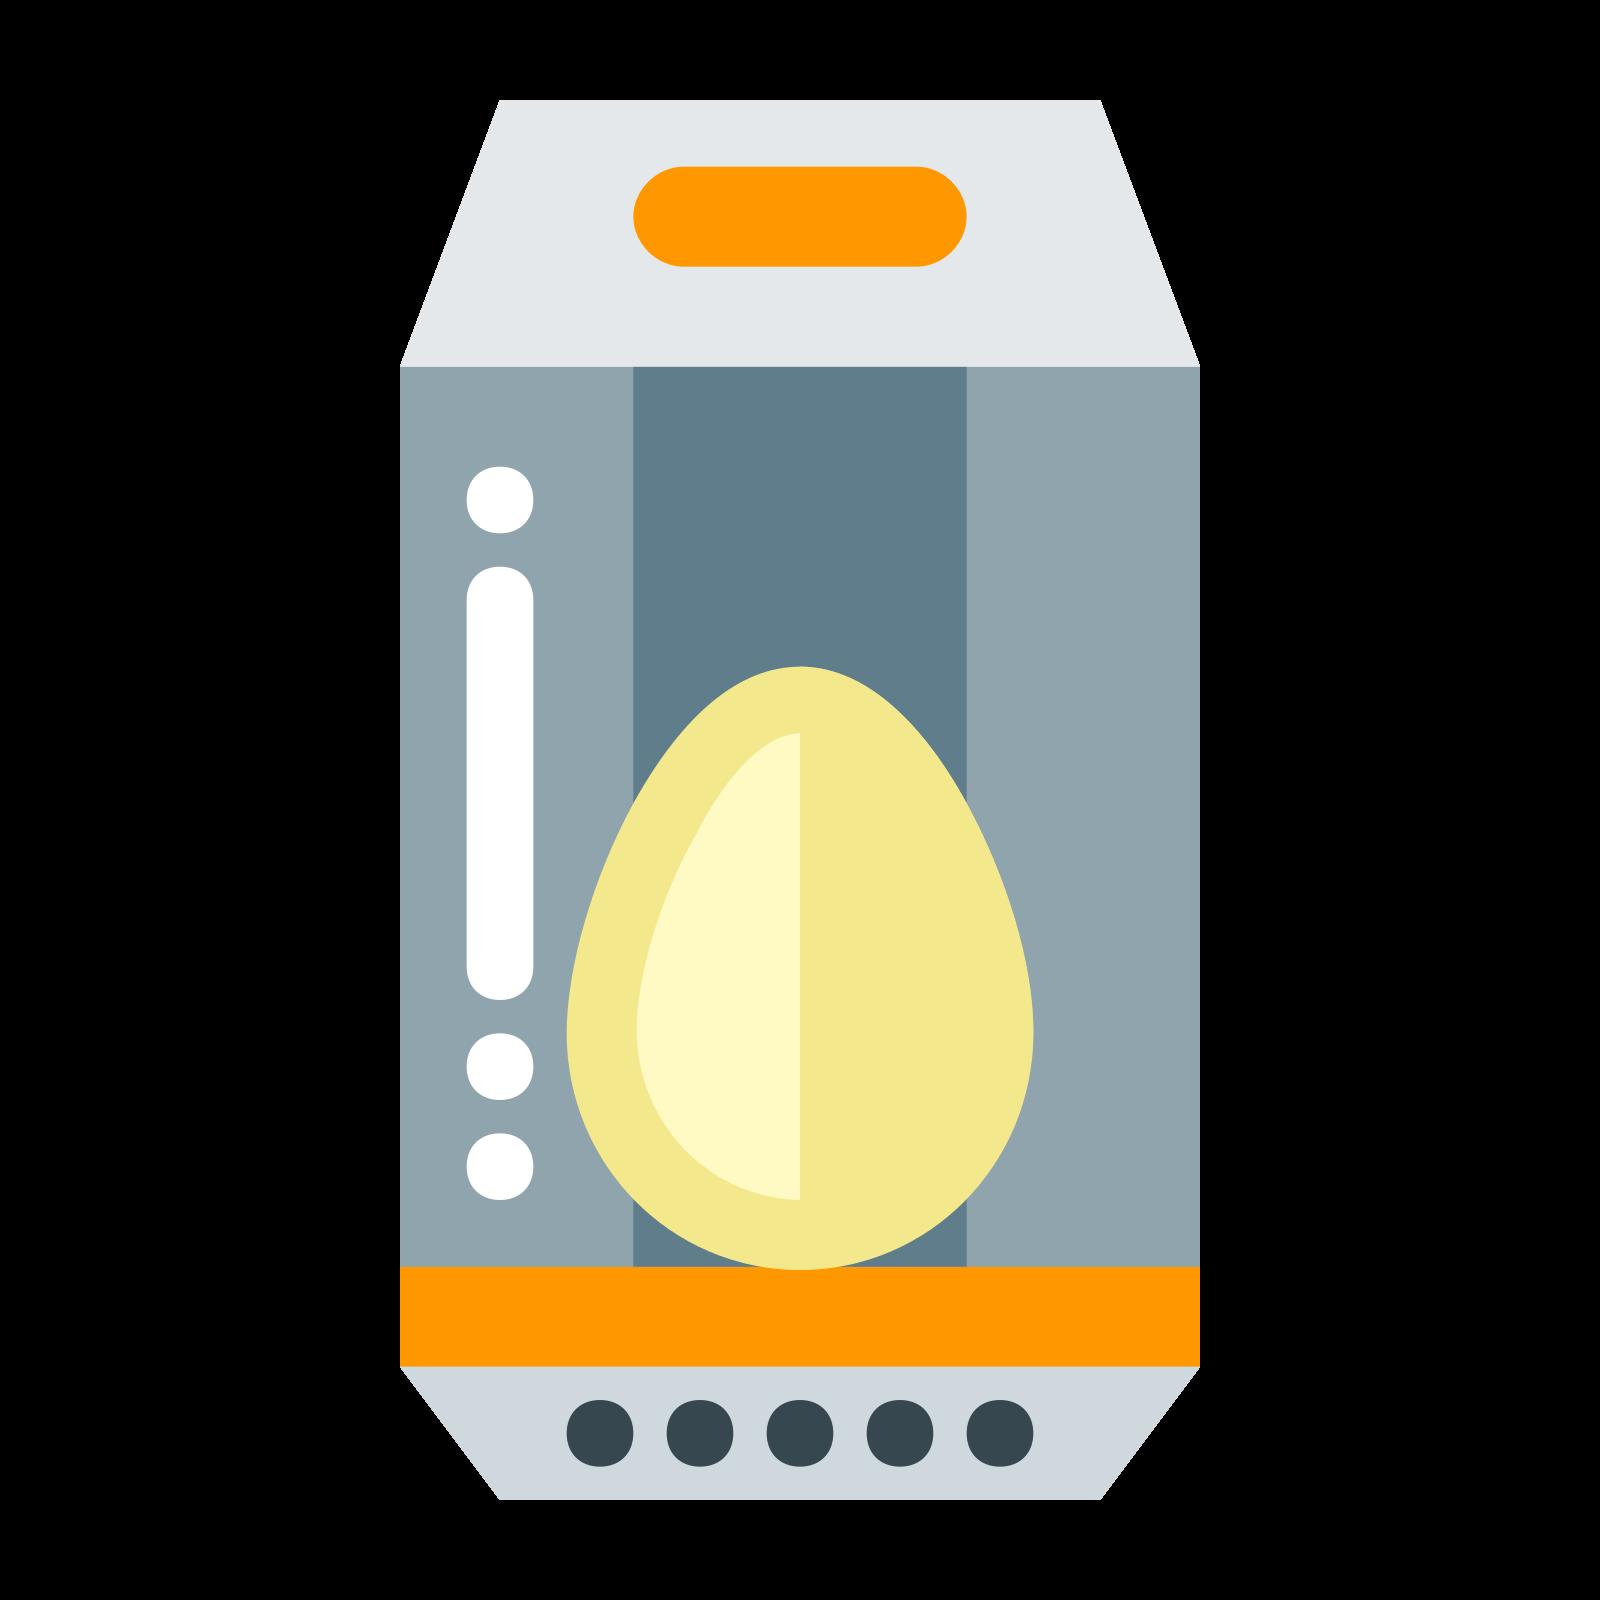 Egg Incubator Unlimited Use icon